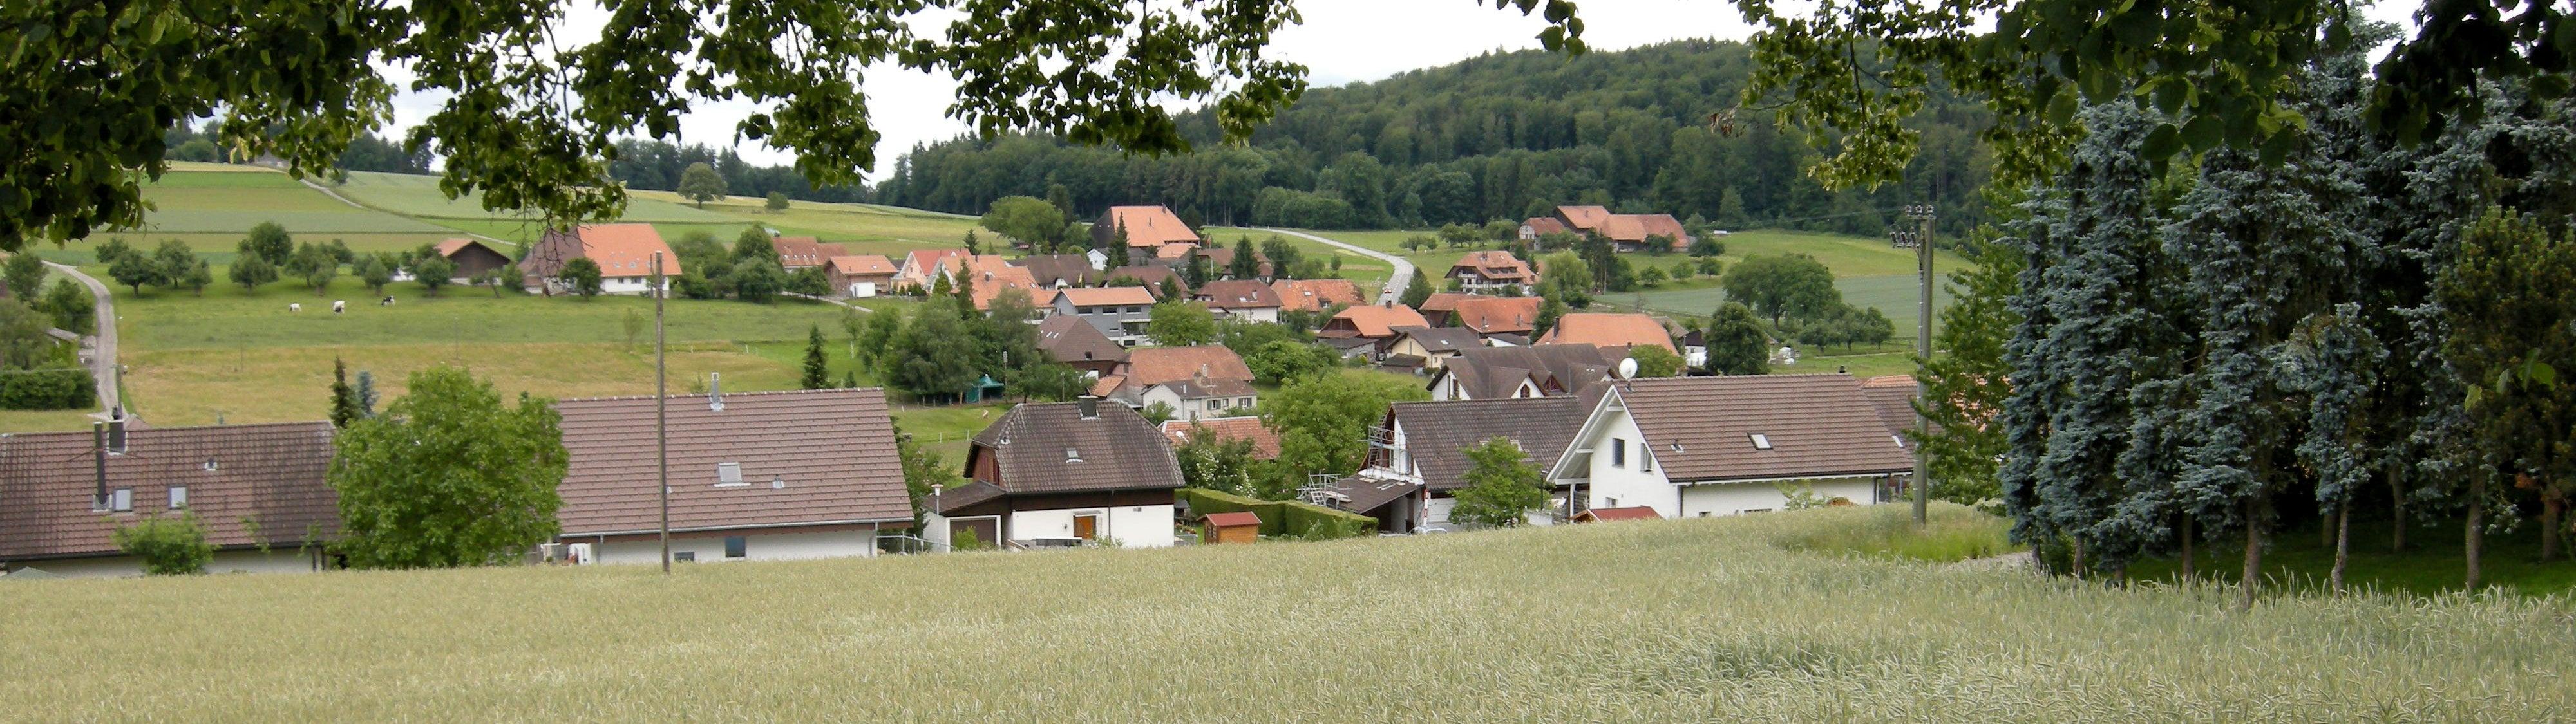 Lüterswil - Gächliwil